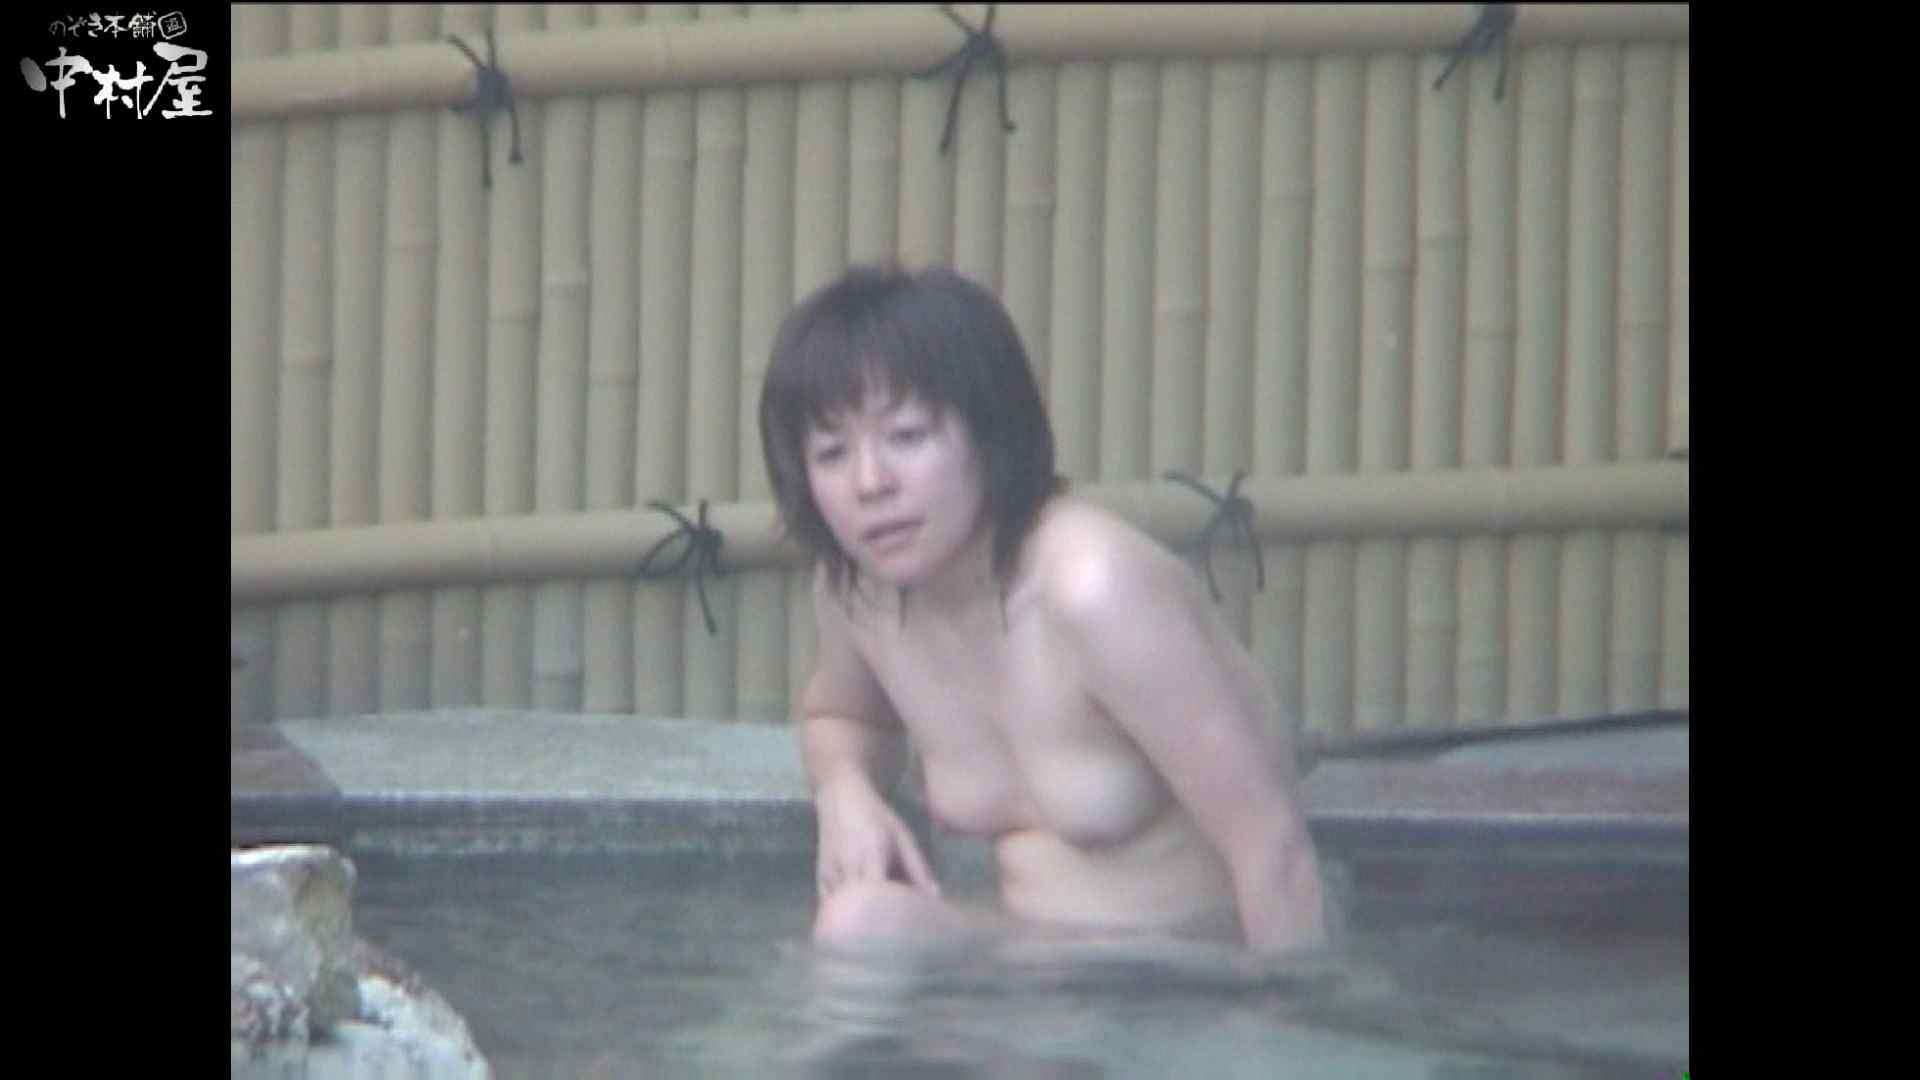 Aquaな露天風呂Vol.985 OLのエロ生活 おめこ無修正画像 28連発 20